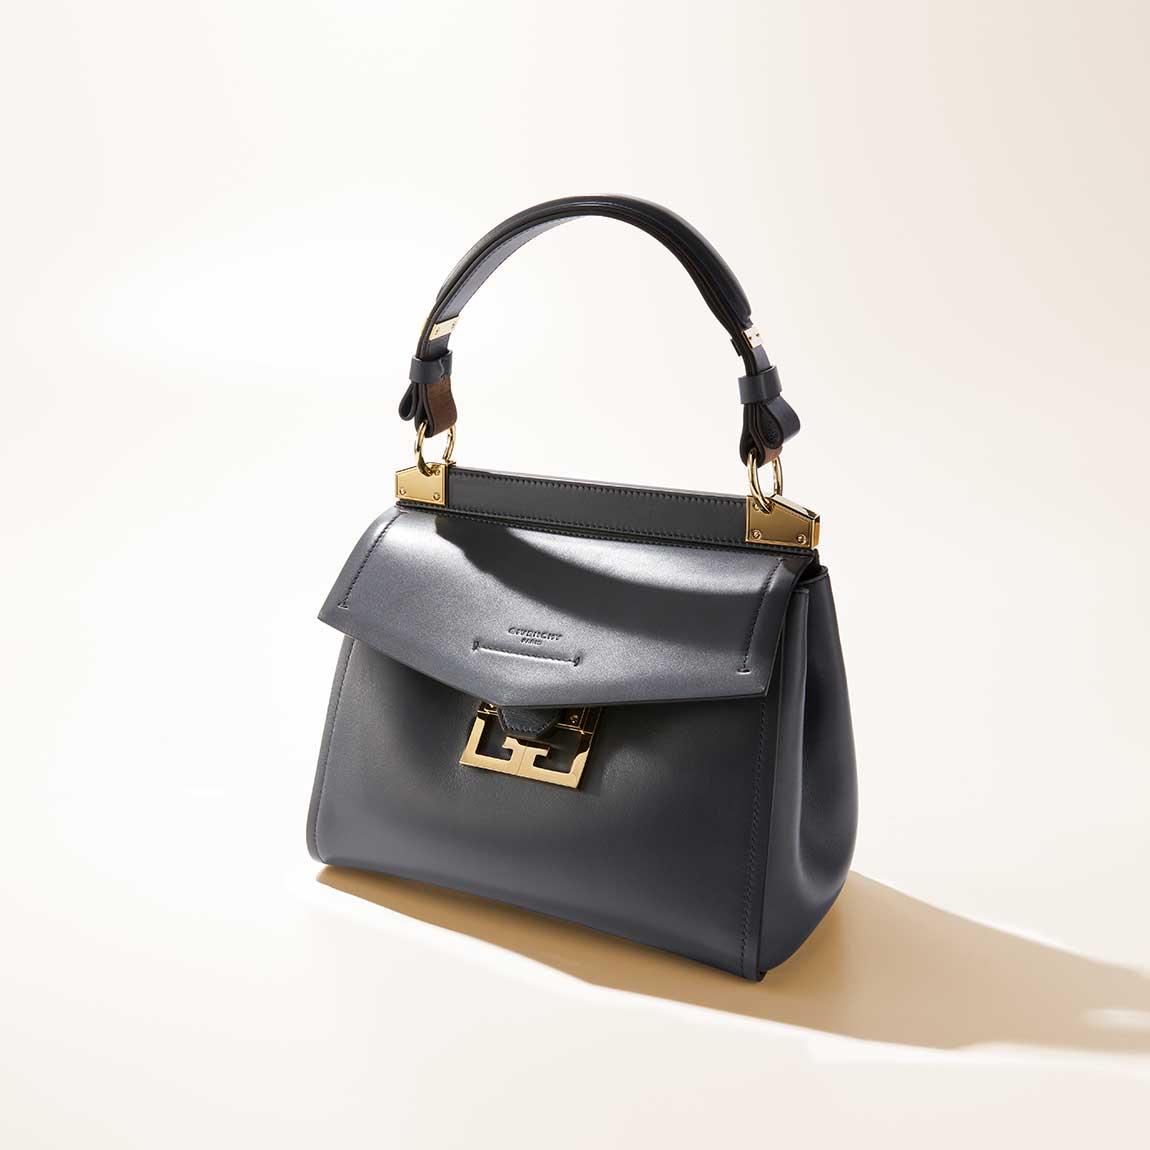 7d6a3616bf6d Prada, Jimmy Choo, Gucci, Lanvin, Dolce & Gabbana | Bergdorf Goodman